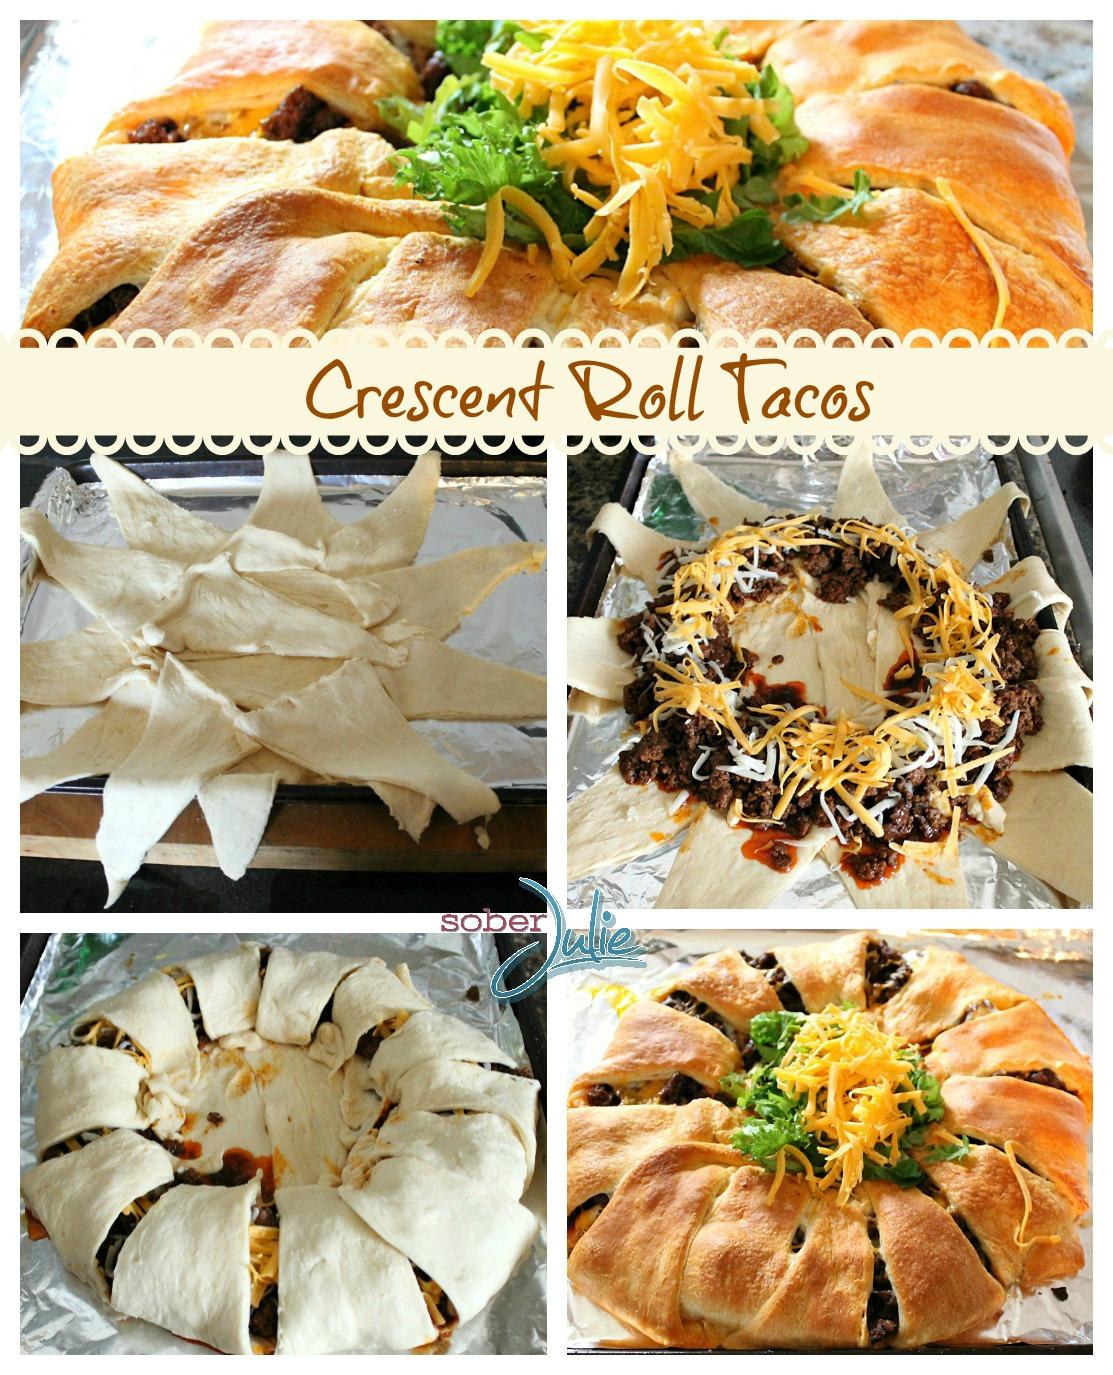 Crescent Roll Tacos recipe Collage